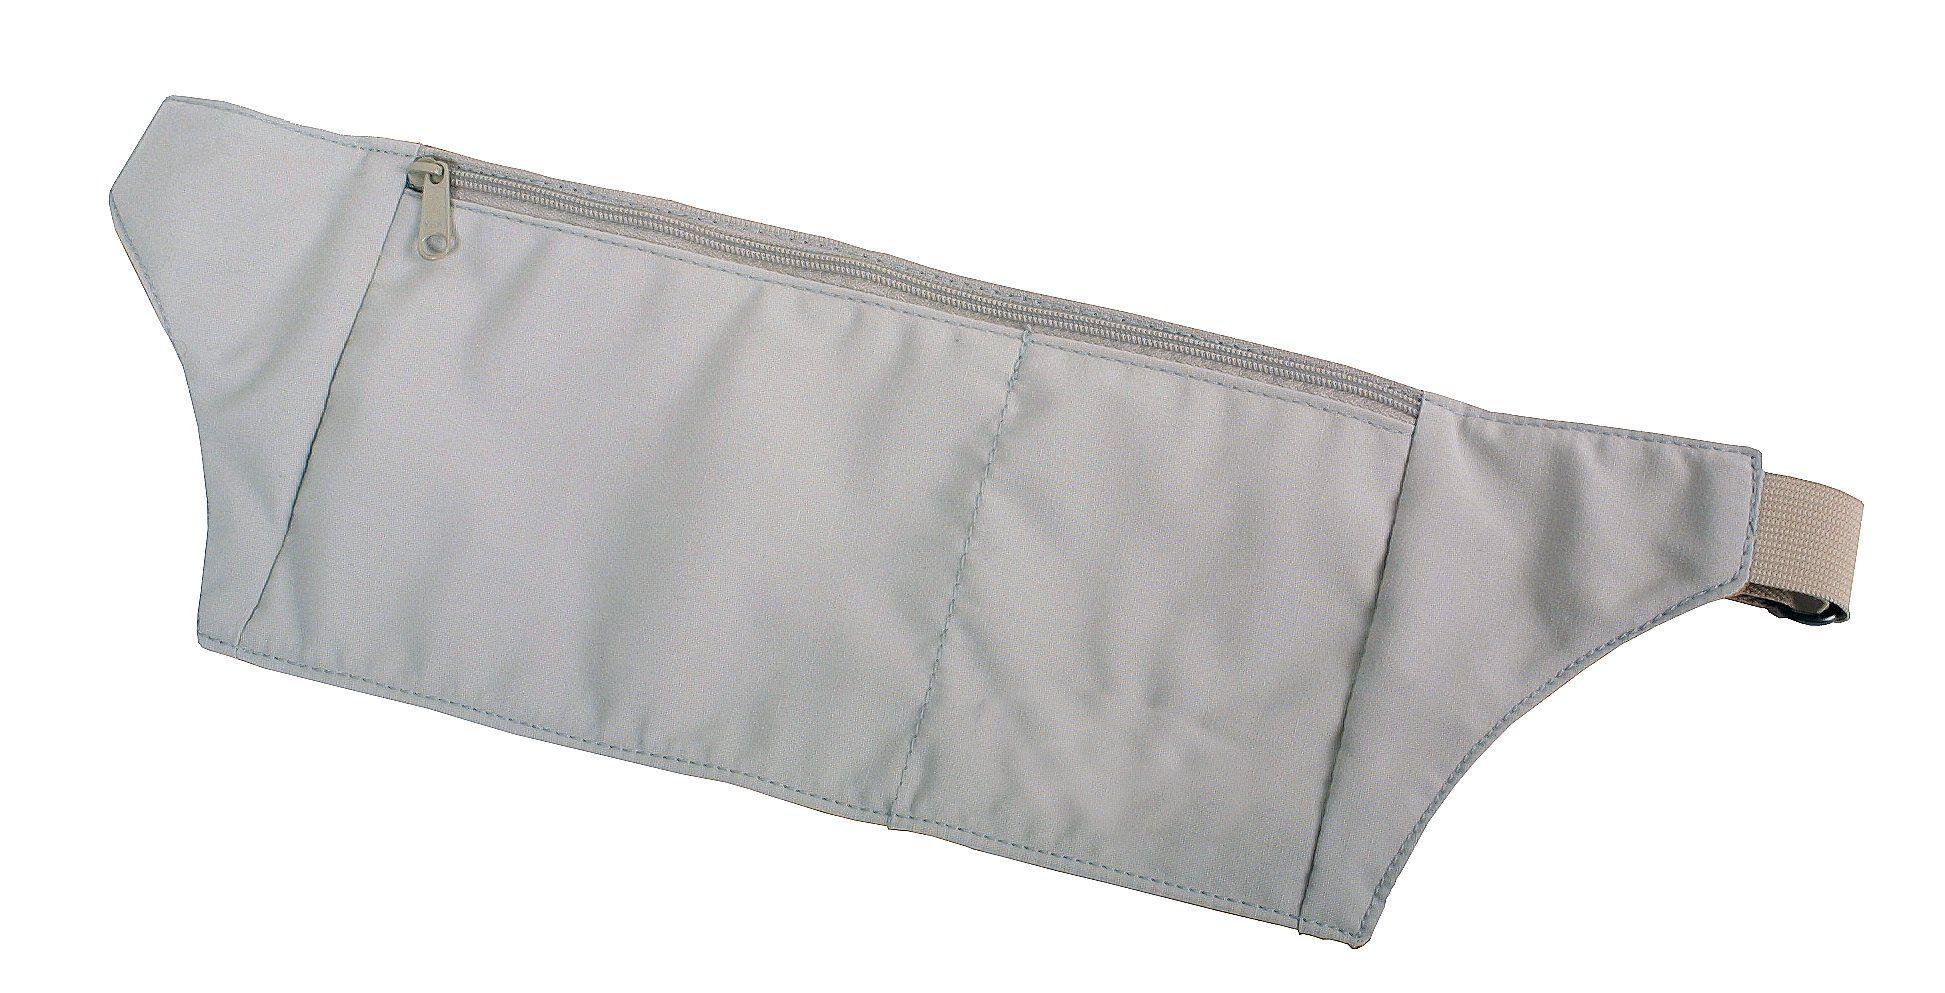 Basic Nature Wertsachenaufbewahrung »Undercover Classic Hüfttasche«